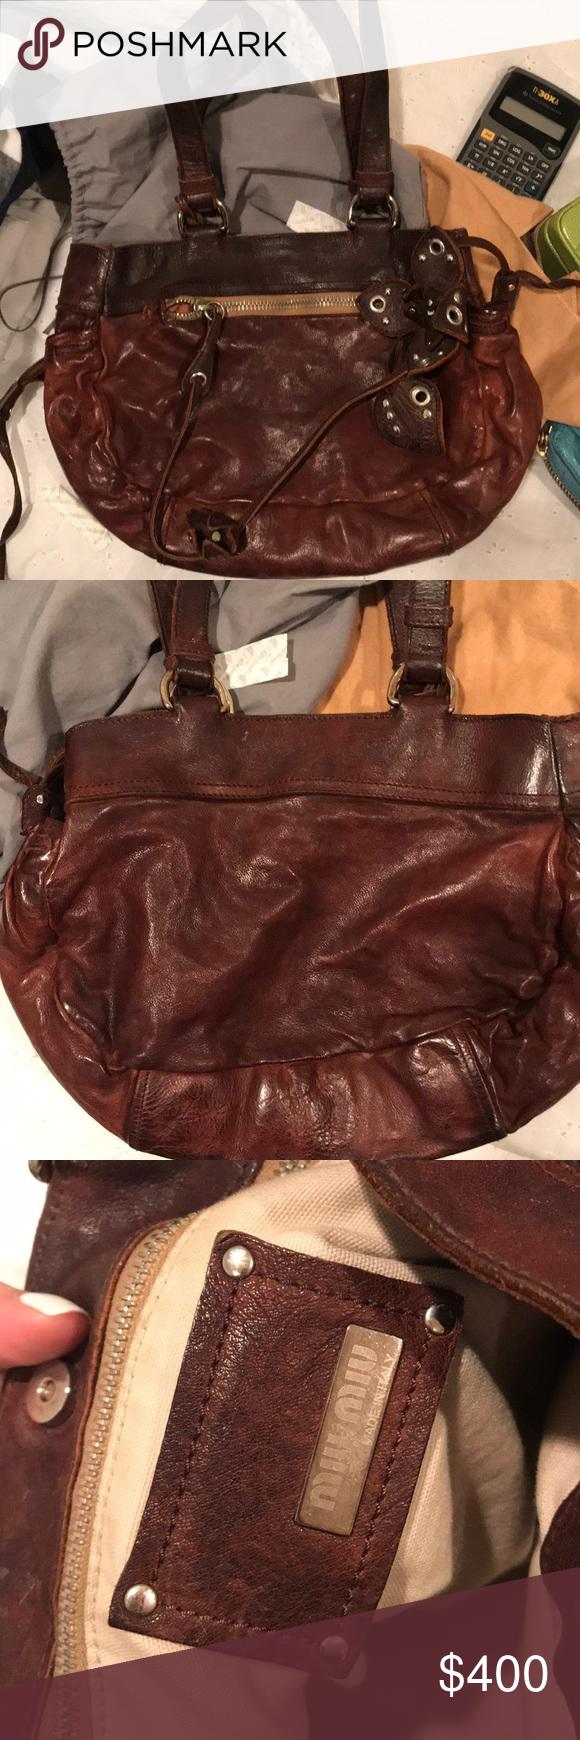 Miu miu bag Vintage brown bag from the spring 2005 collection Miu Miu Bags  Shoulder Bags bce2eddf48